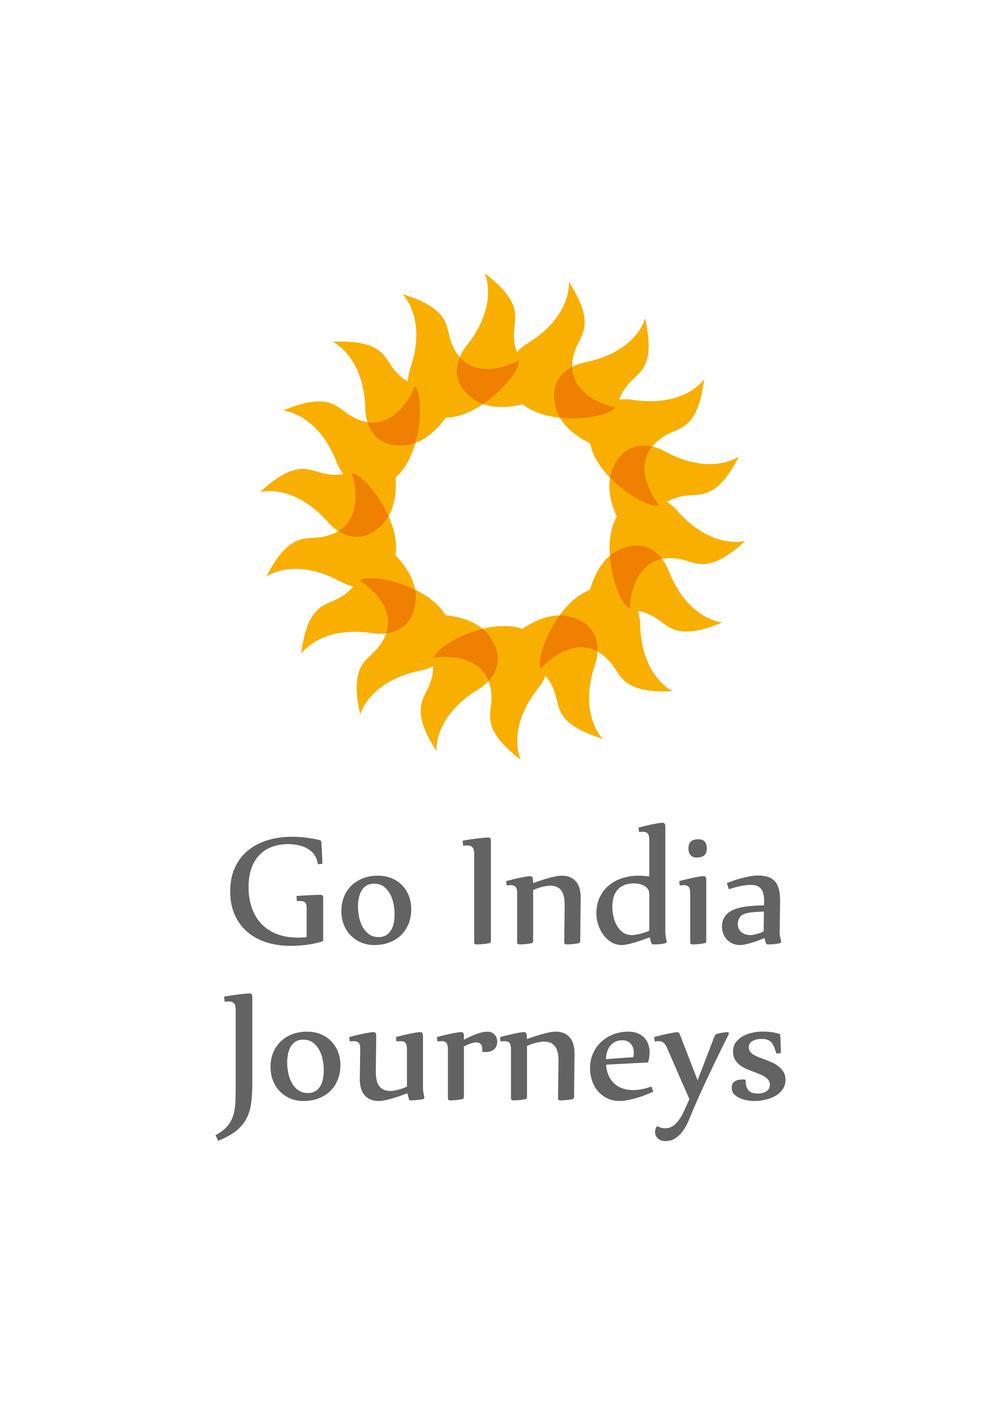 GO INDIA -LOGO.JPG